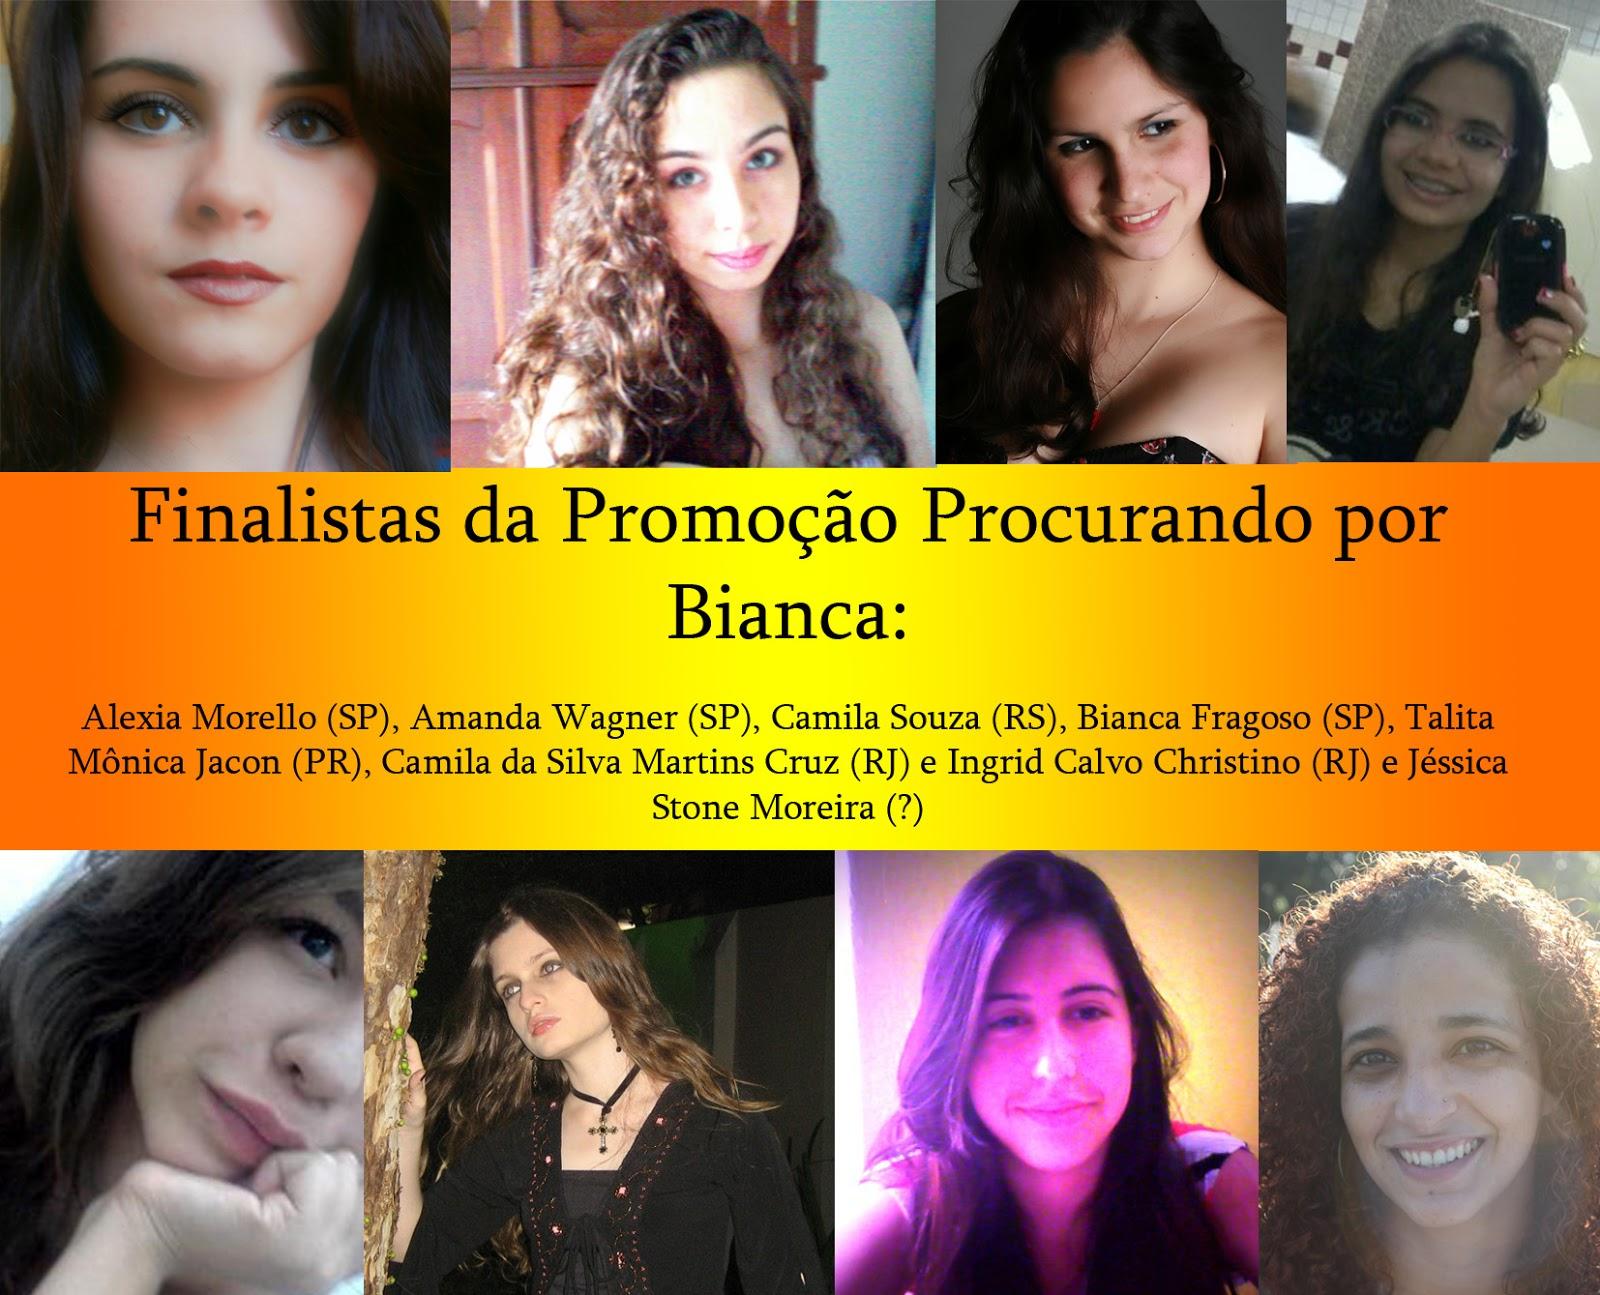 http://2.bp.blogspot.com/-PQVrMs1vSKk/USOvemwkBdI/AAAAAAAAKms/PC1_ES-7zN0/s1600/Finalistas+promo+Procurando+Bianca.jpg